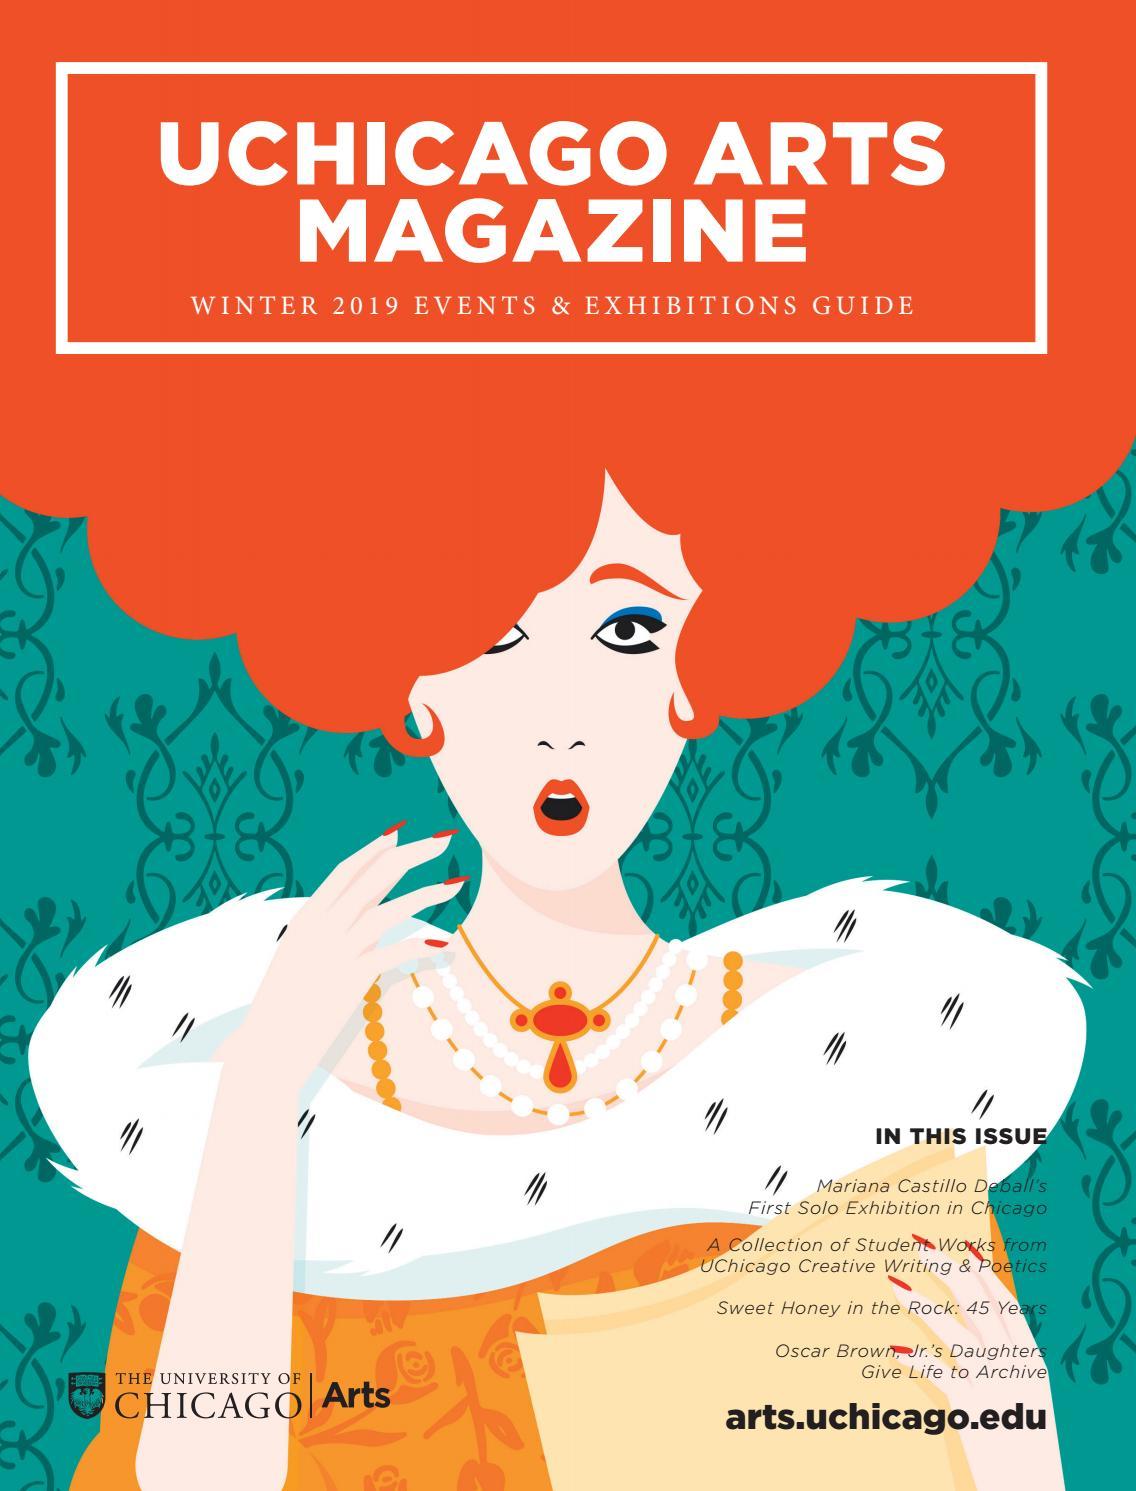 f4f2bf46e48 Winter 2019 UChicago Arts Magazine by UChicagoArts - issuu